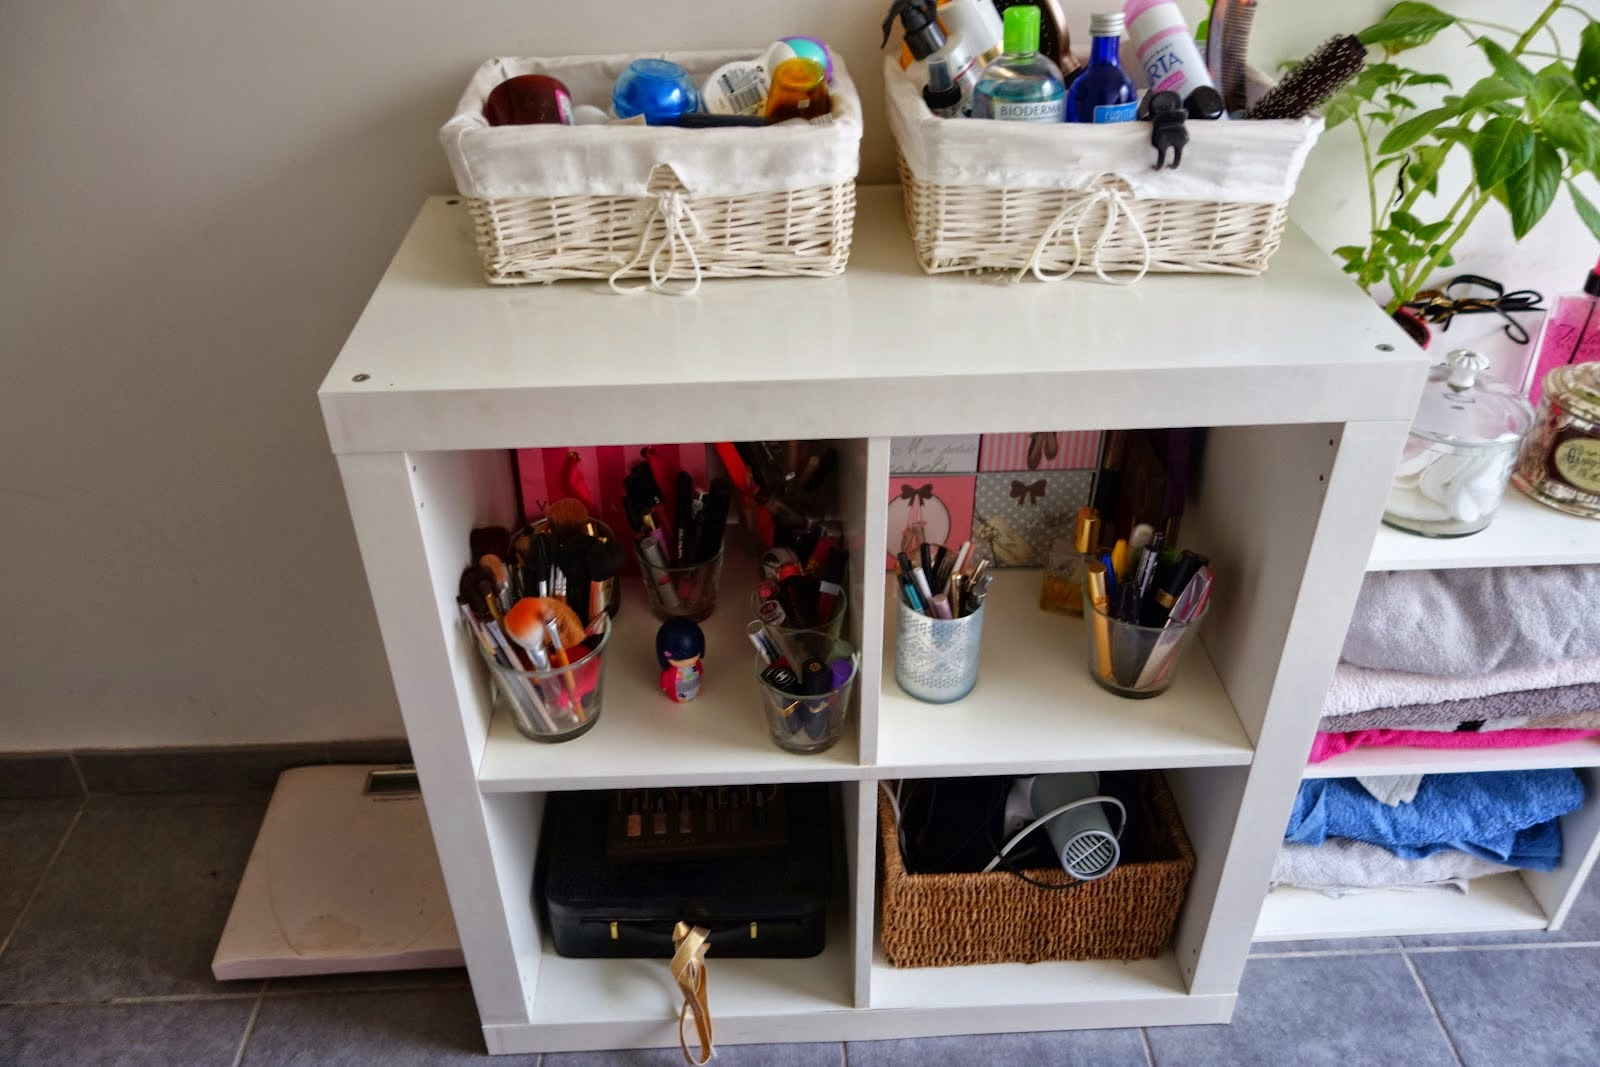 Meuble rangement salle de bain ikea meuble d coration maison for Meuble rangement salle de bain bois